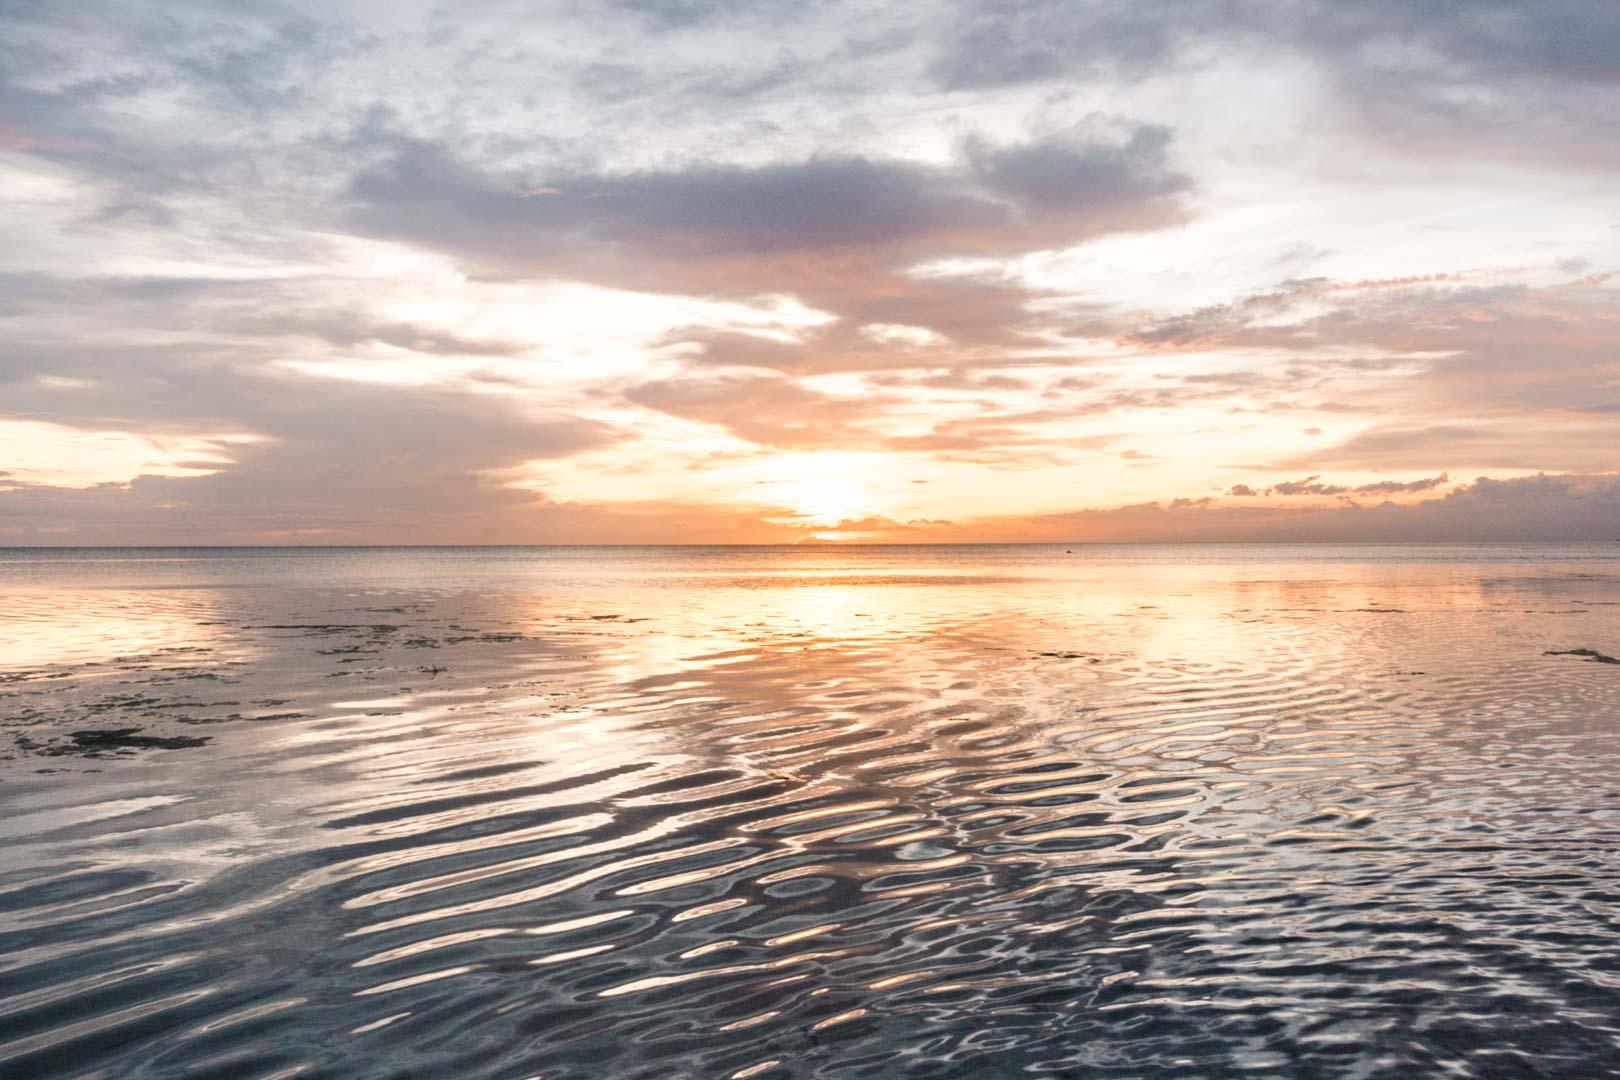 Sunset at Solangon Beach